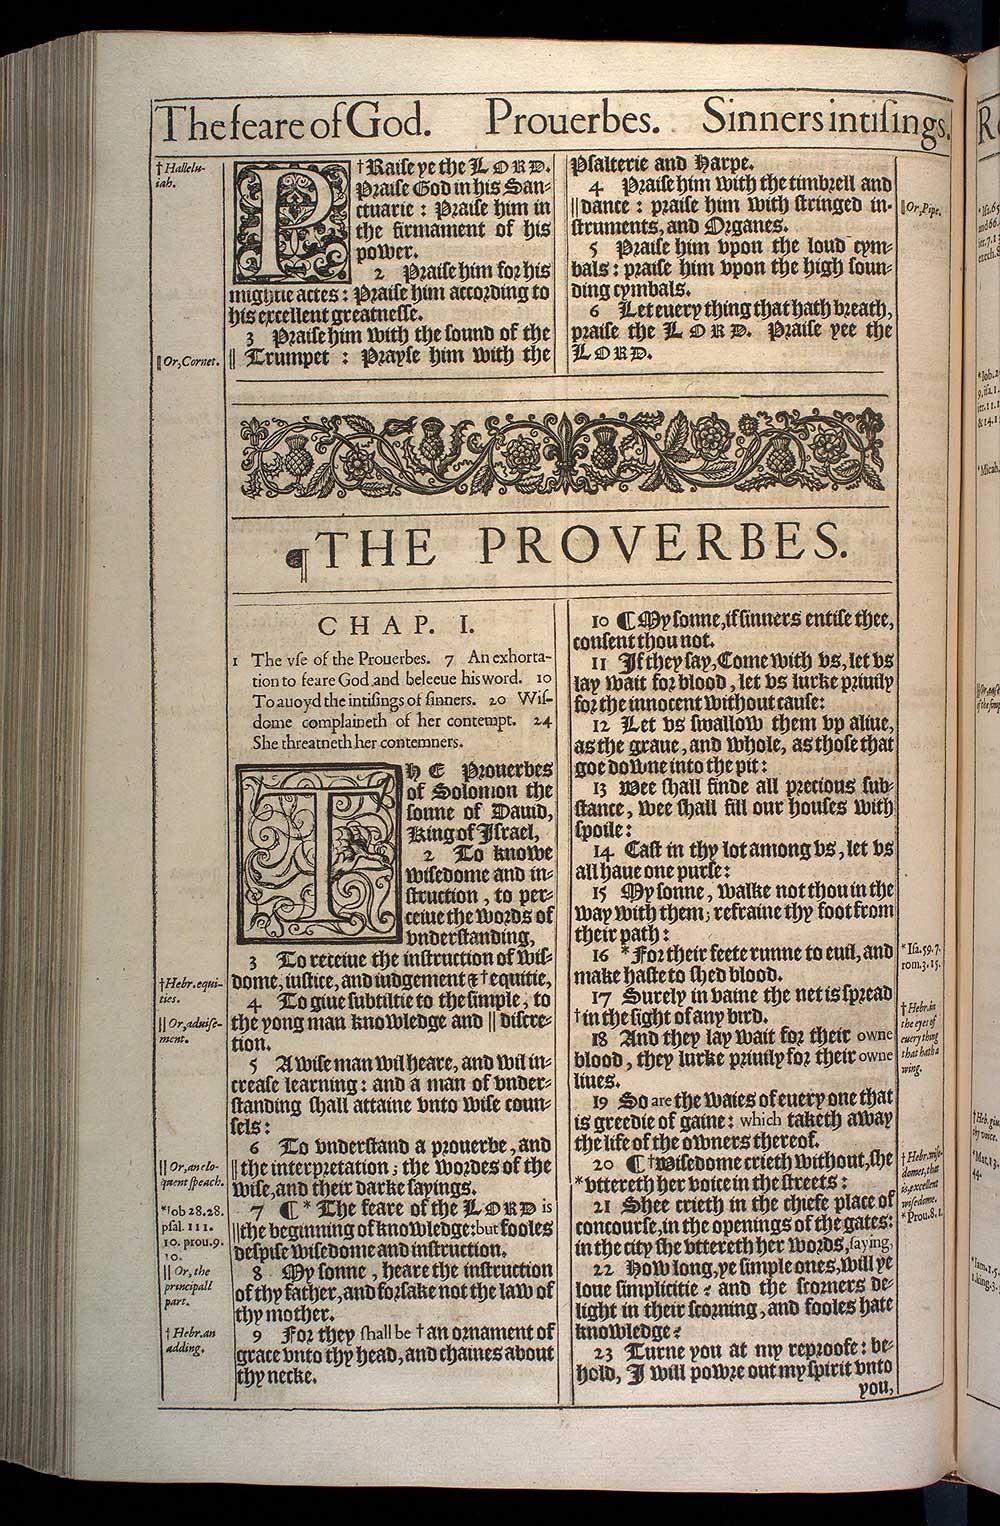 Proverbs Chapter 1 Original 1611 Bible Scan